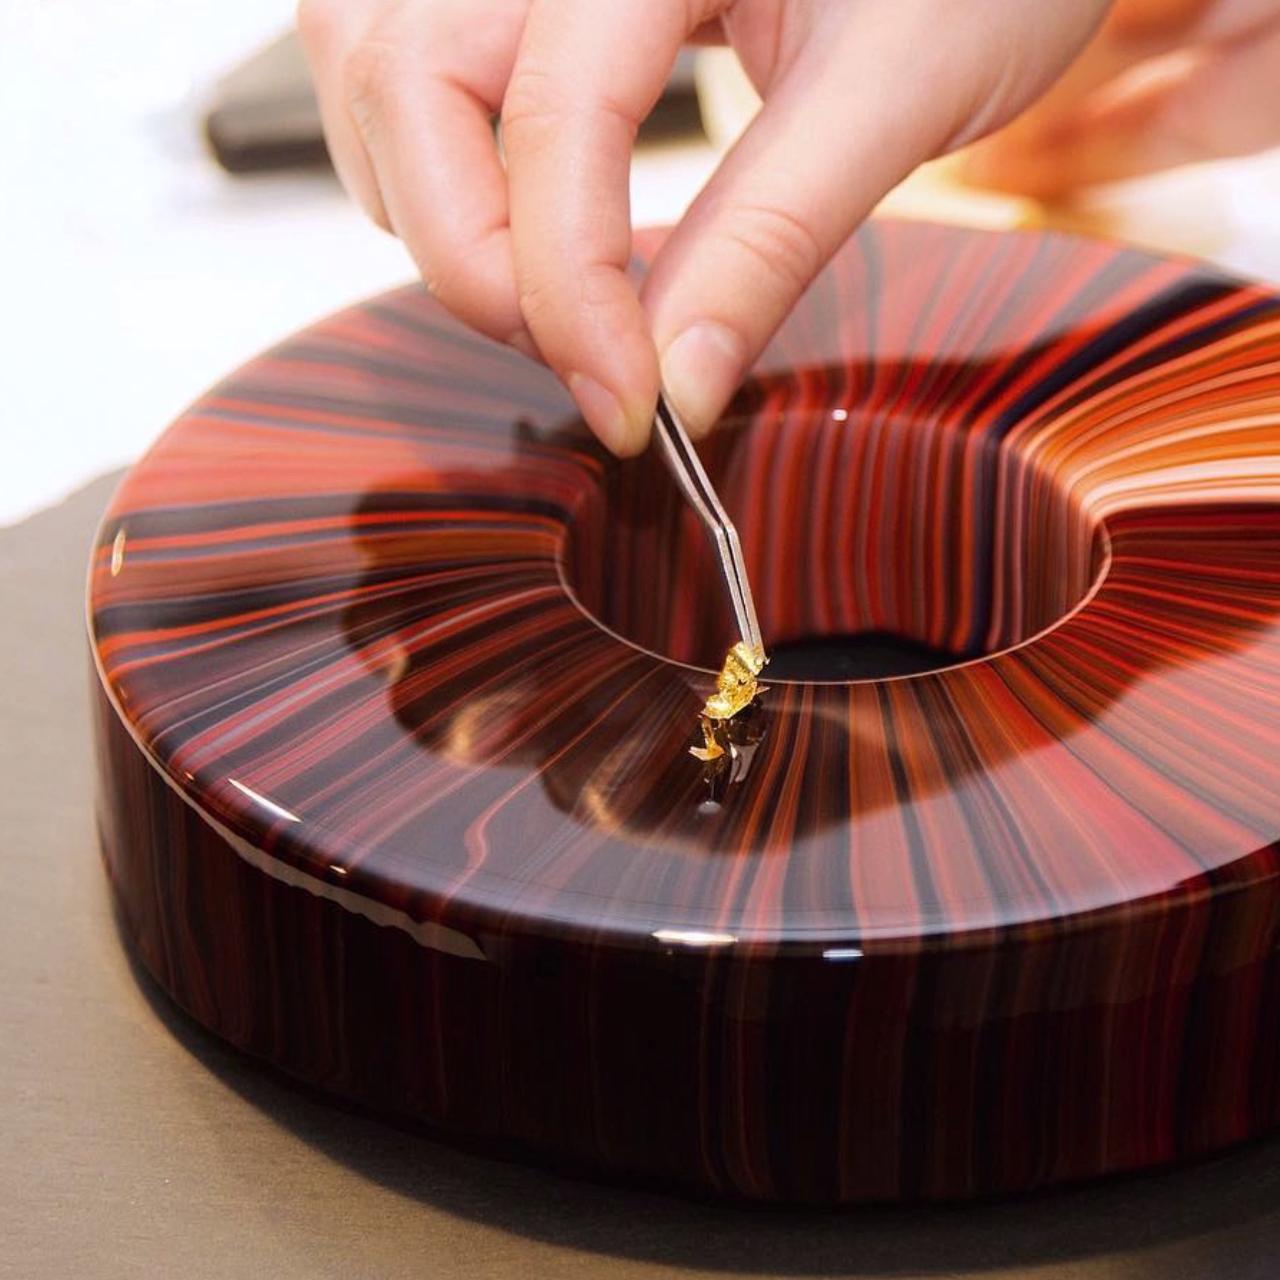 Mirror Glaze Cakes by Ksenia Penkina are Mesmerizing #cakedecoratingvideos